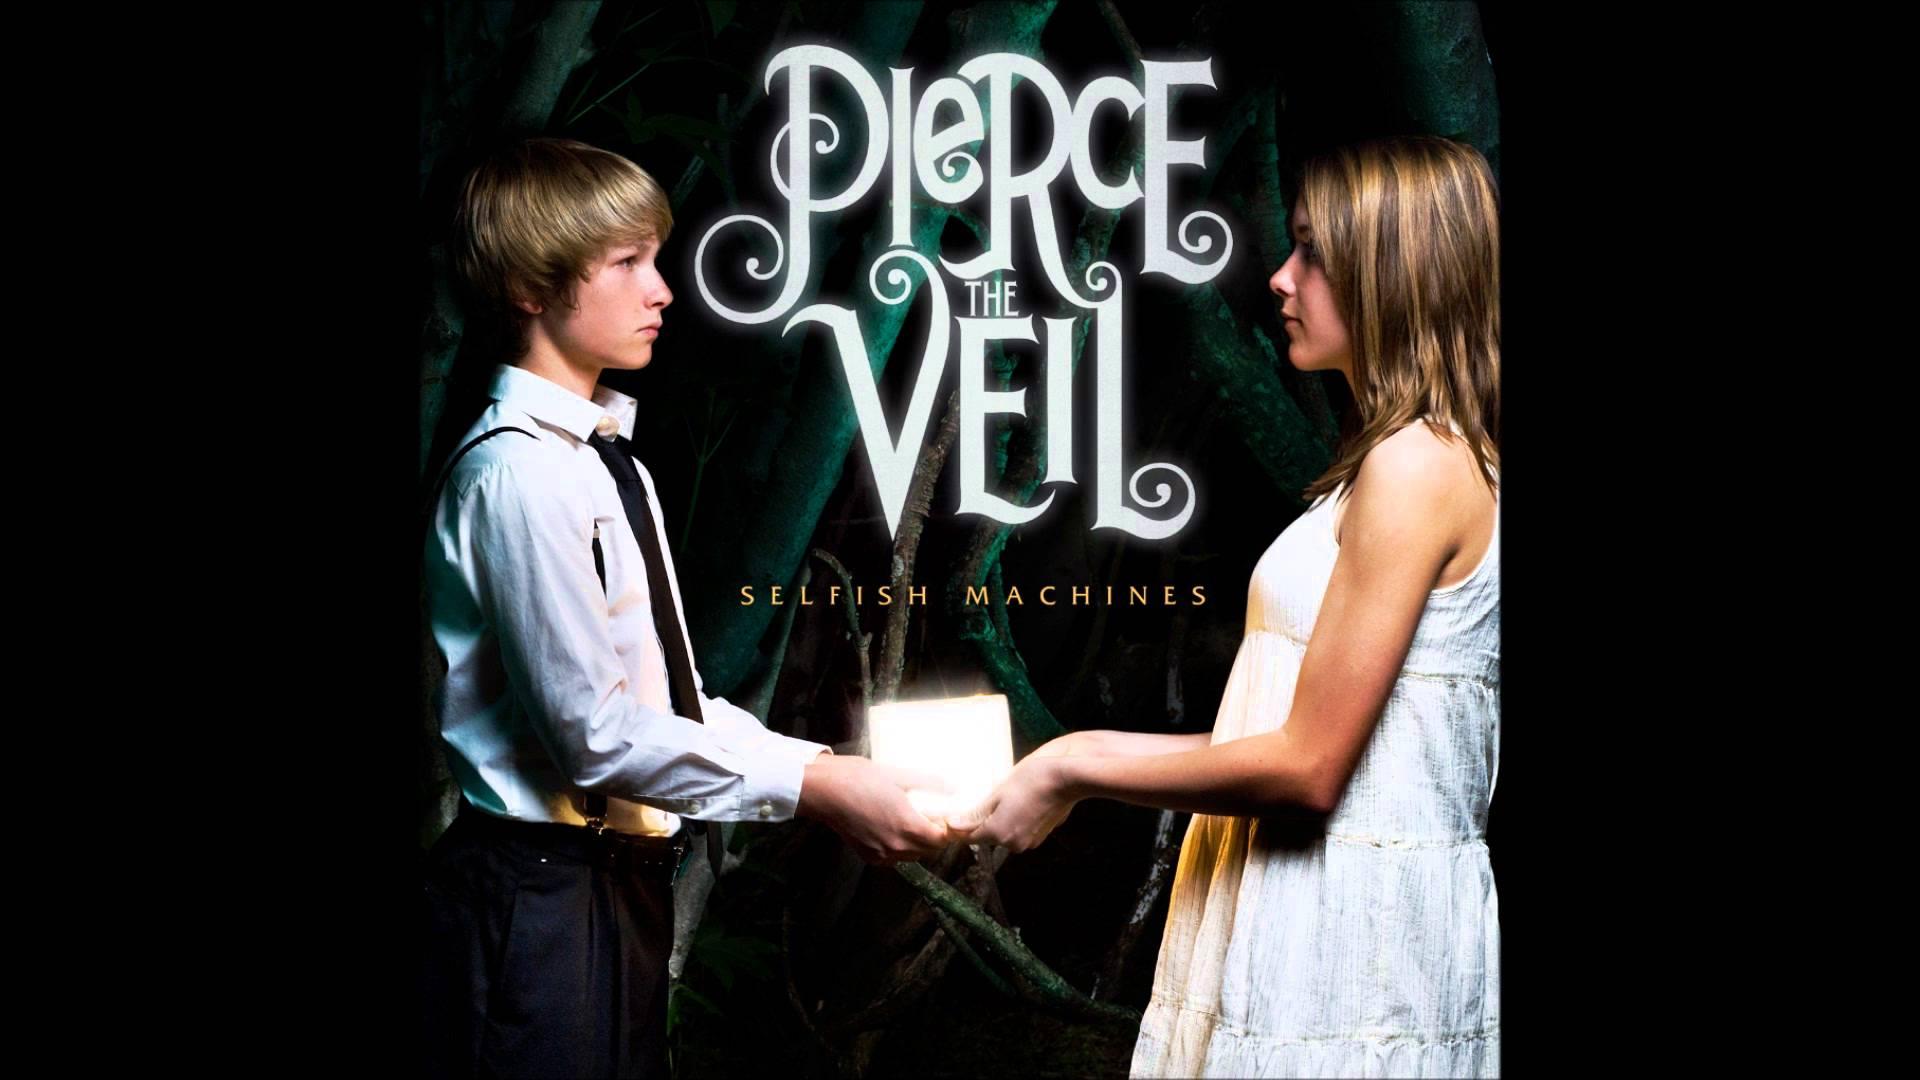 Pierce The Veil Wallpapers Wallpaper Cave